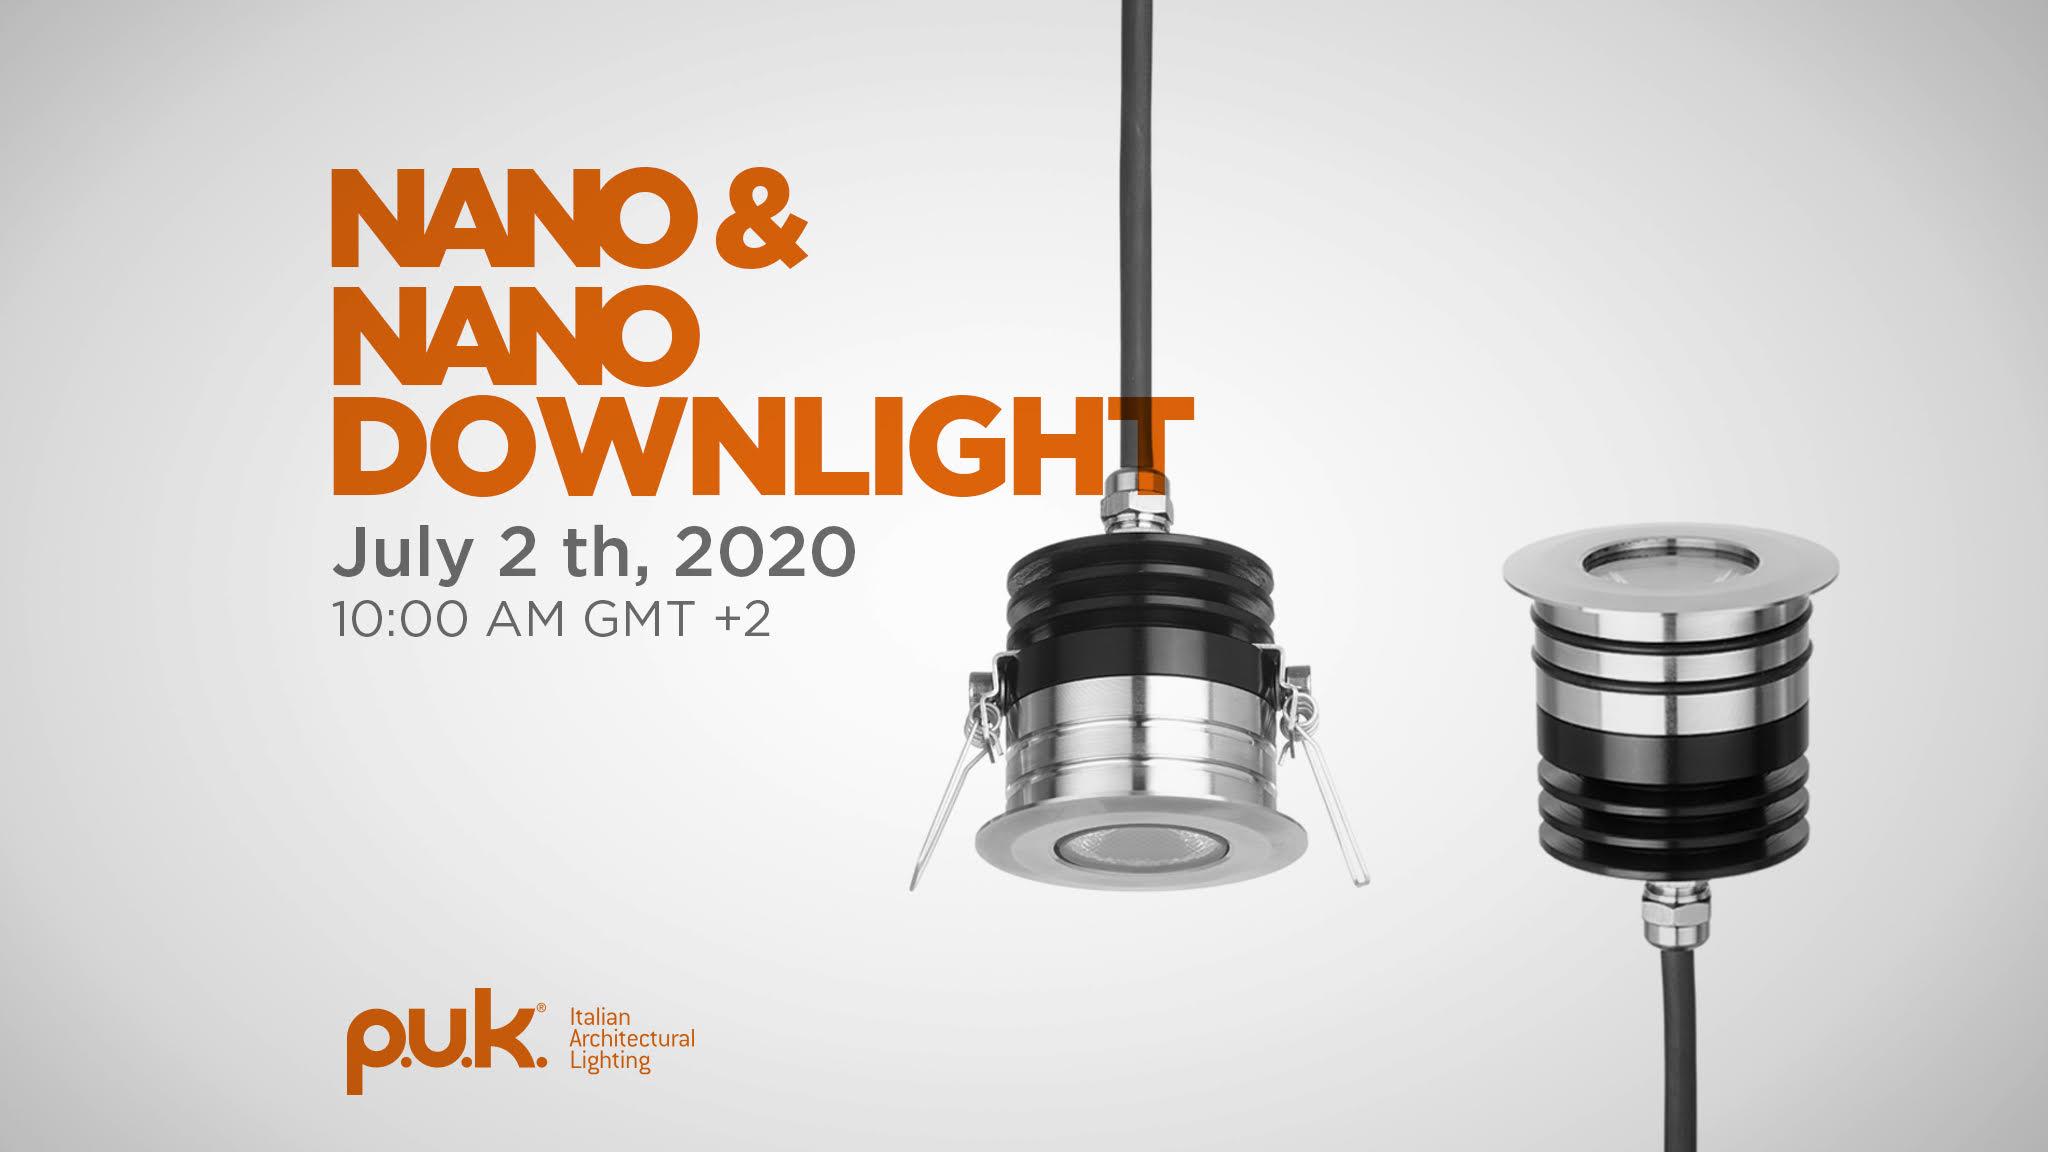 Nano e Nano Downlight